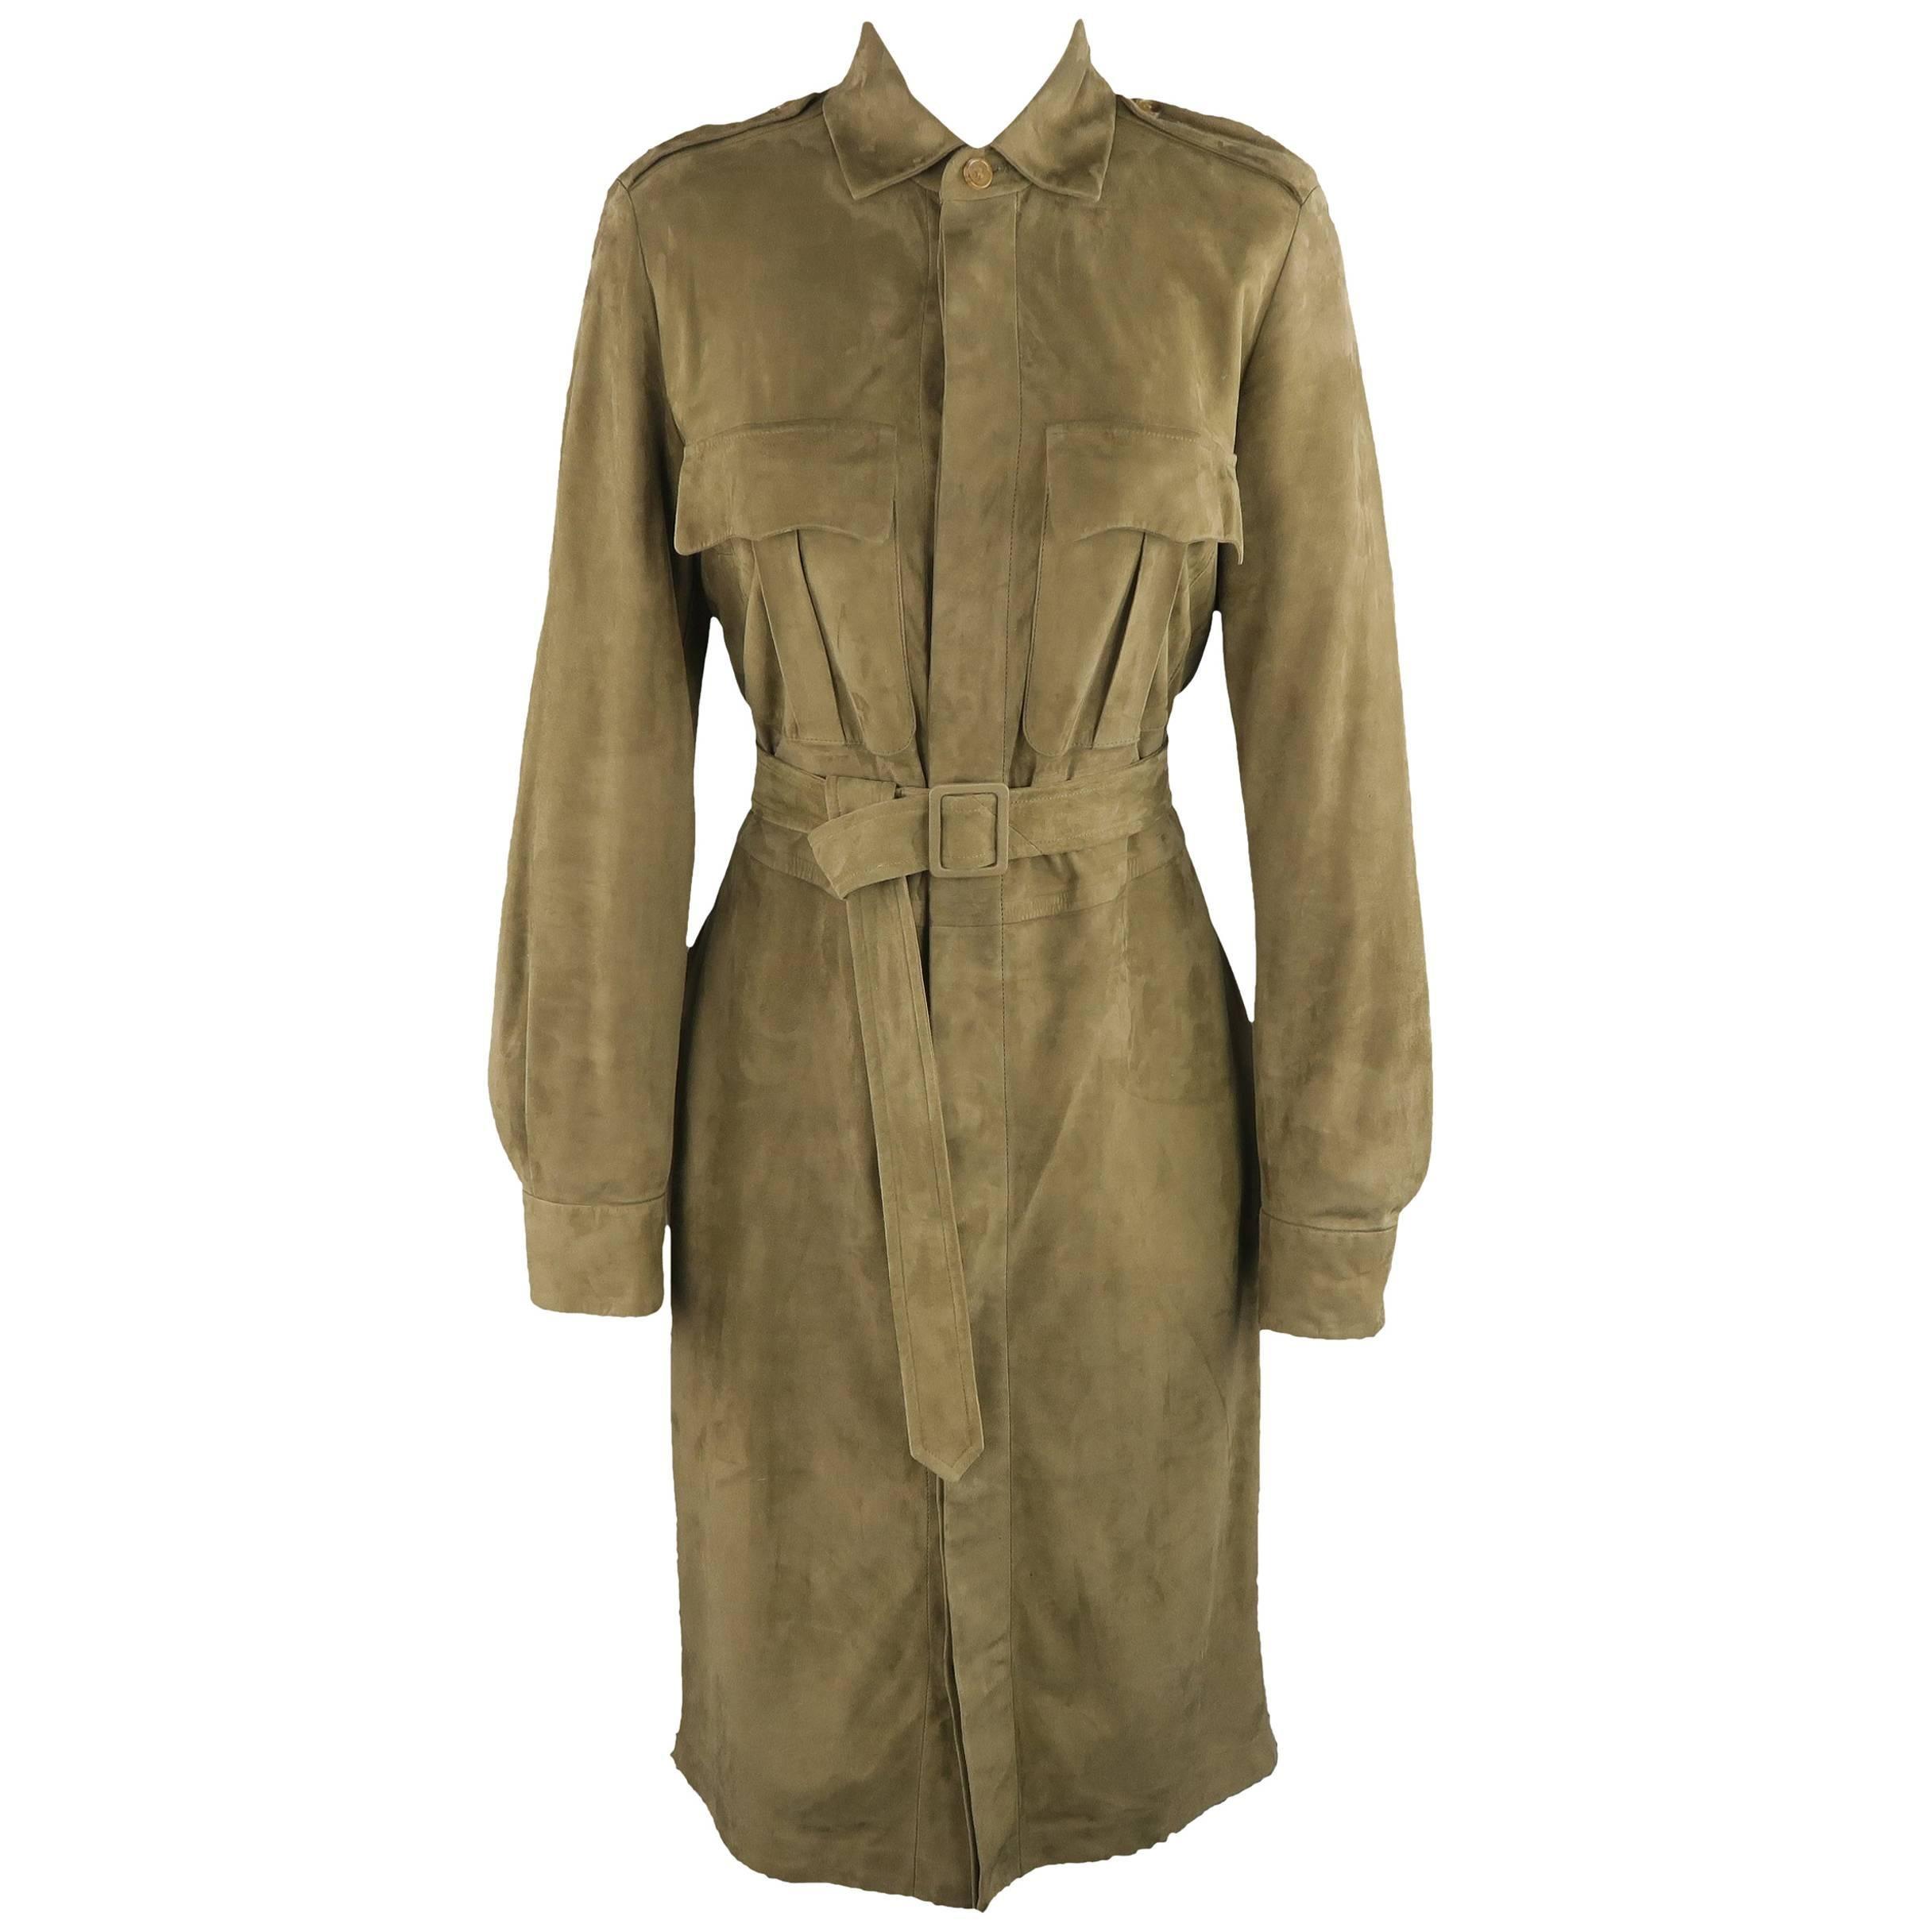 Ralph Lauren Collection Olive Green Suede Safari Dress  - Size 8